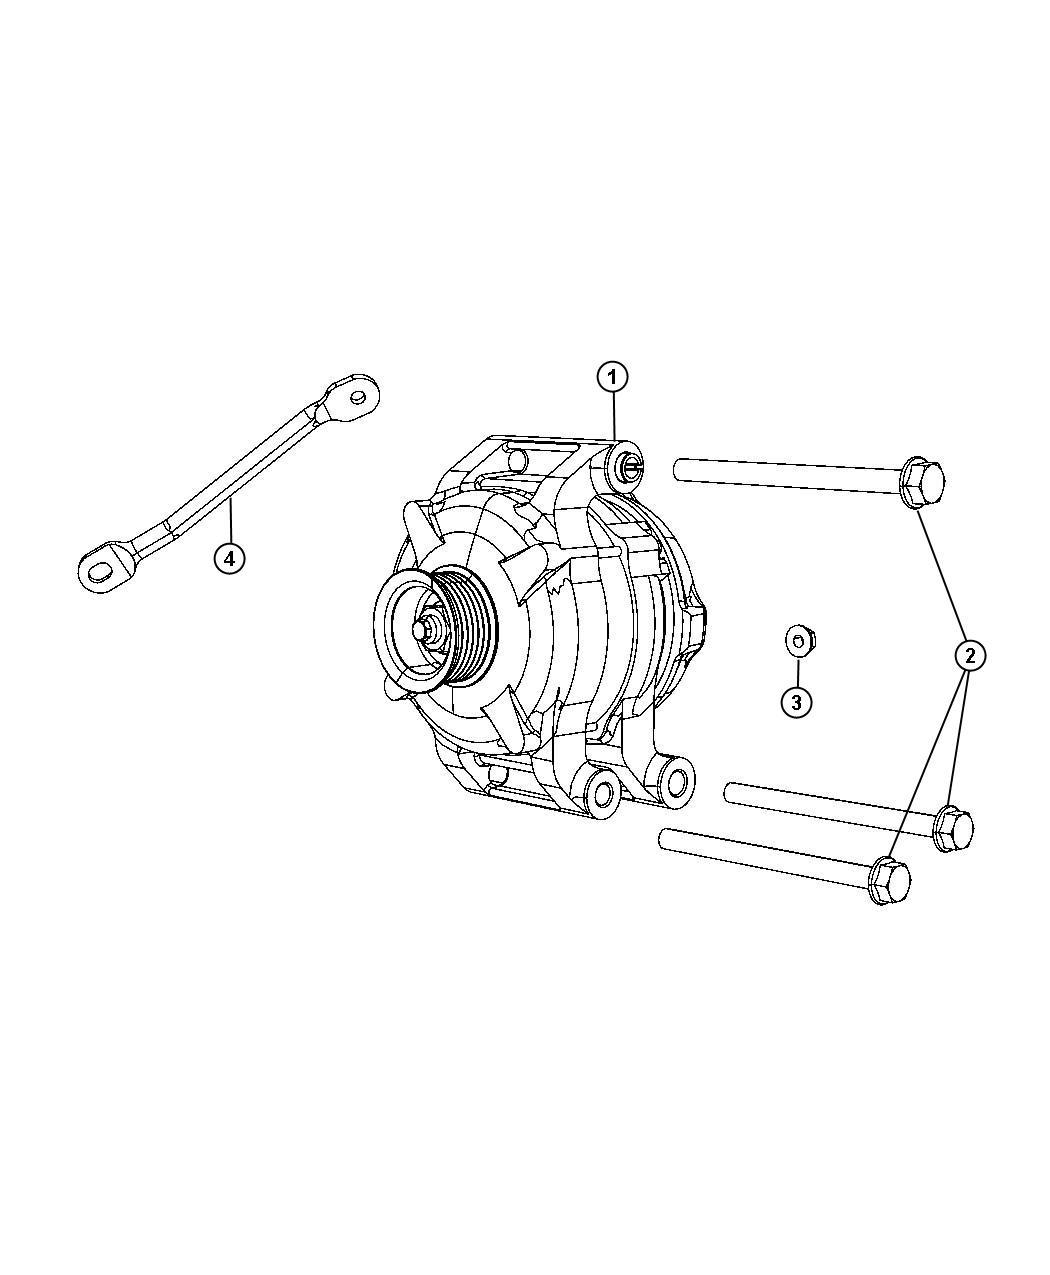 Chrysler 300 Strut. Alternator bracket. Engine, side, rwd